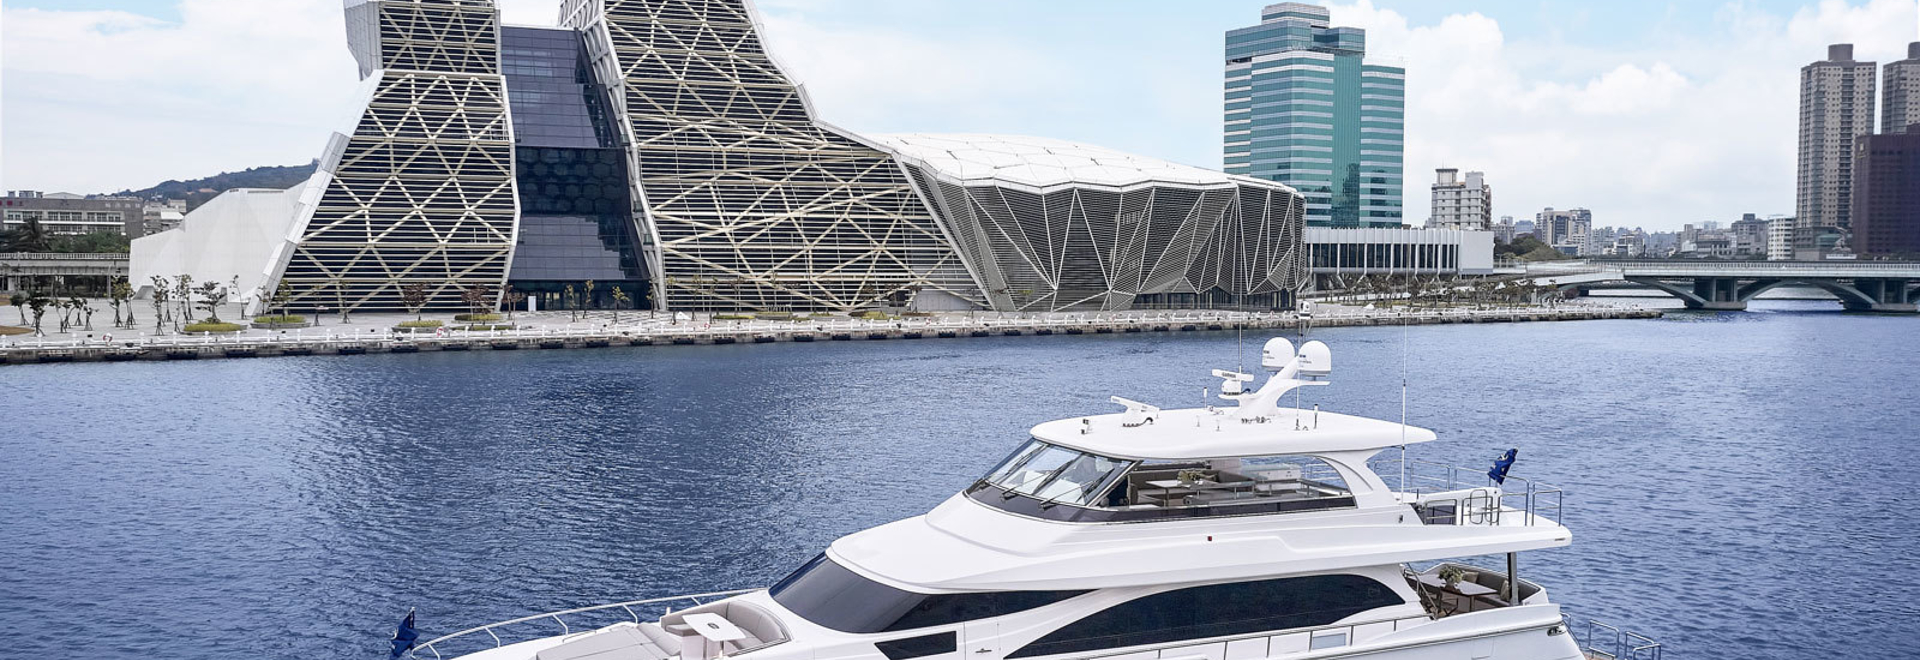 Horizon Yachts rivela il primo yacht 26m E81